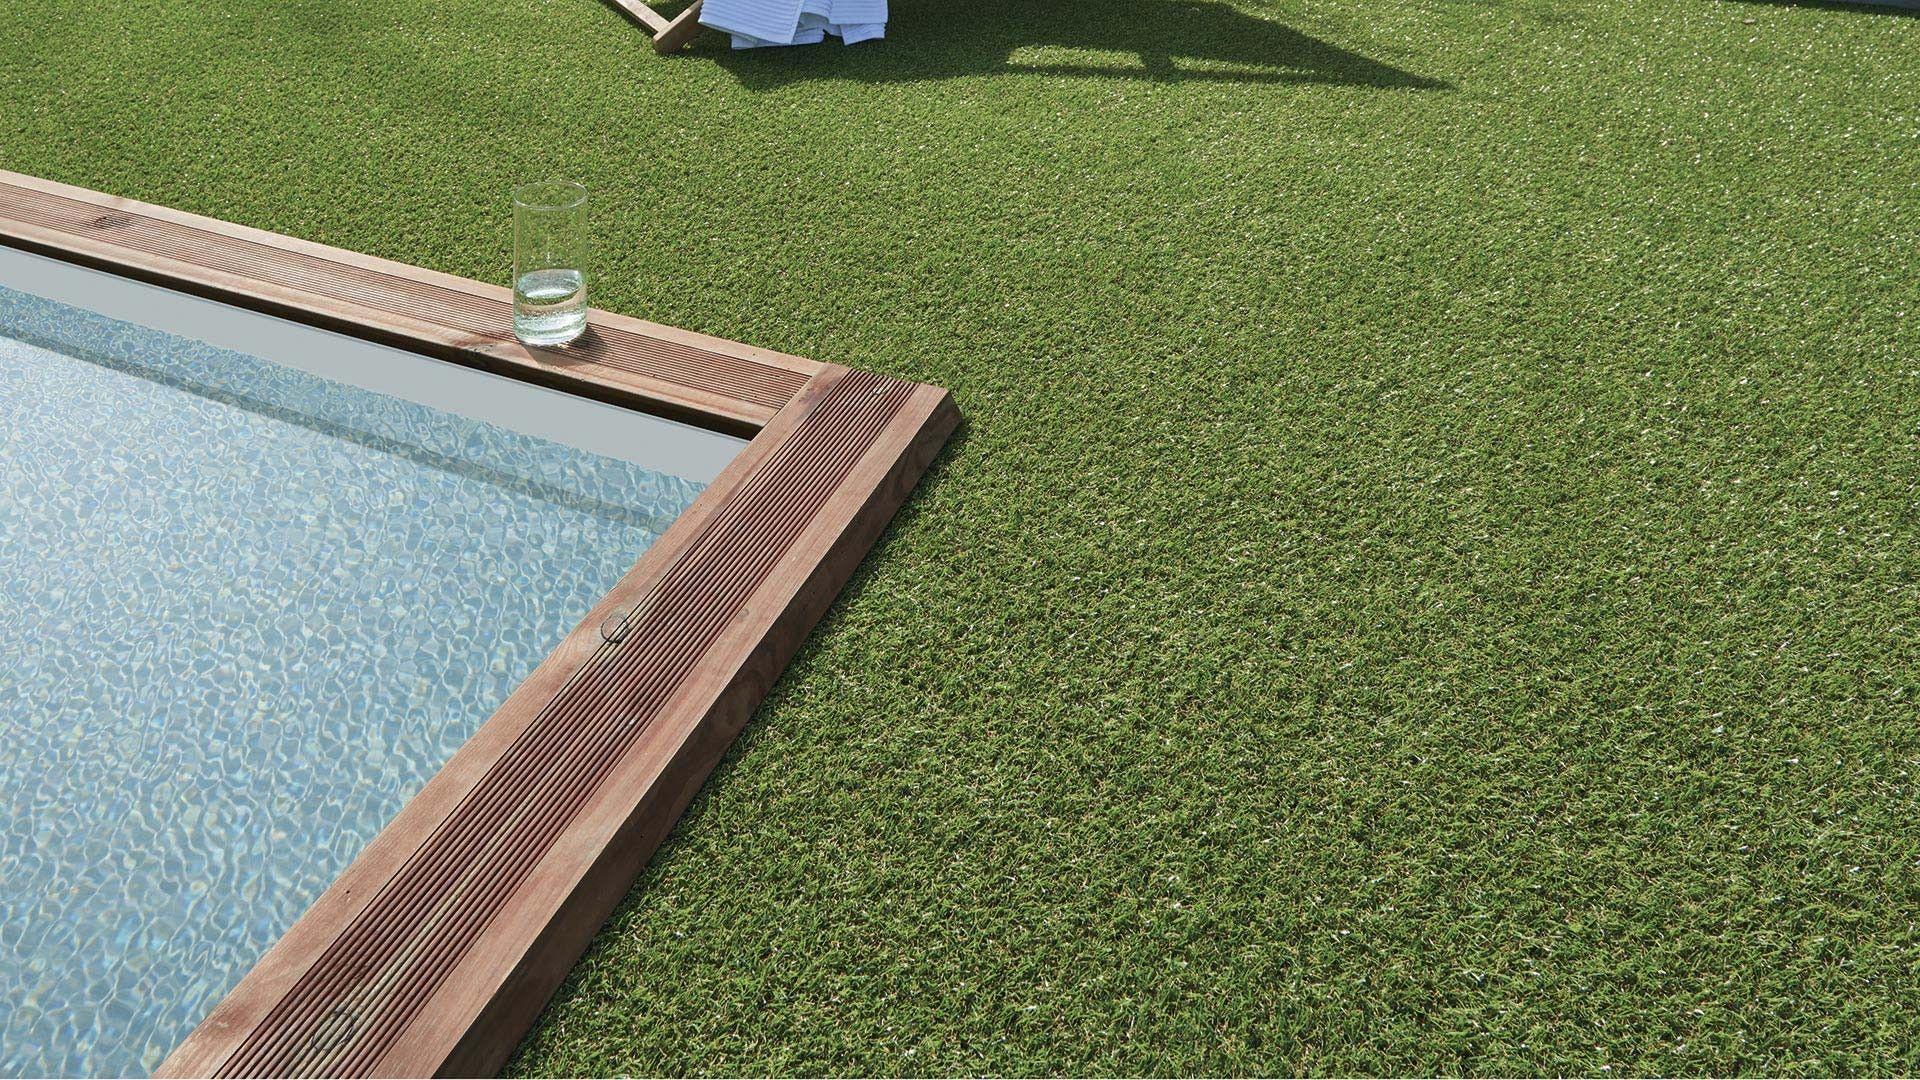 gazon synth tique malaga sols pinterest gazon synth tique gazon et pelouse. Black Bedroom Furniture Sets. Home Design Ideas